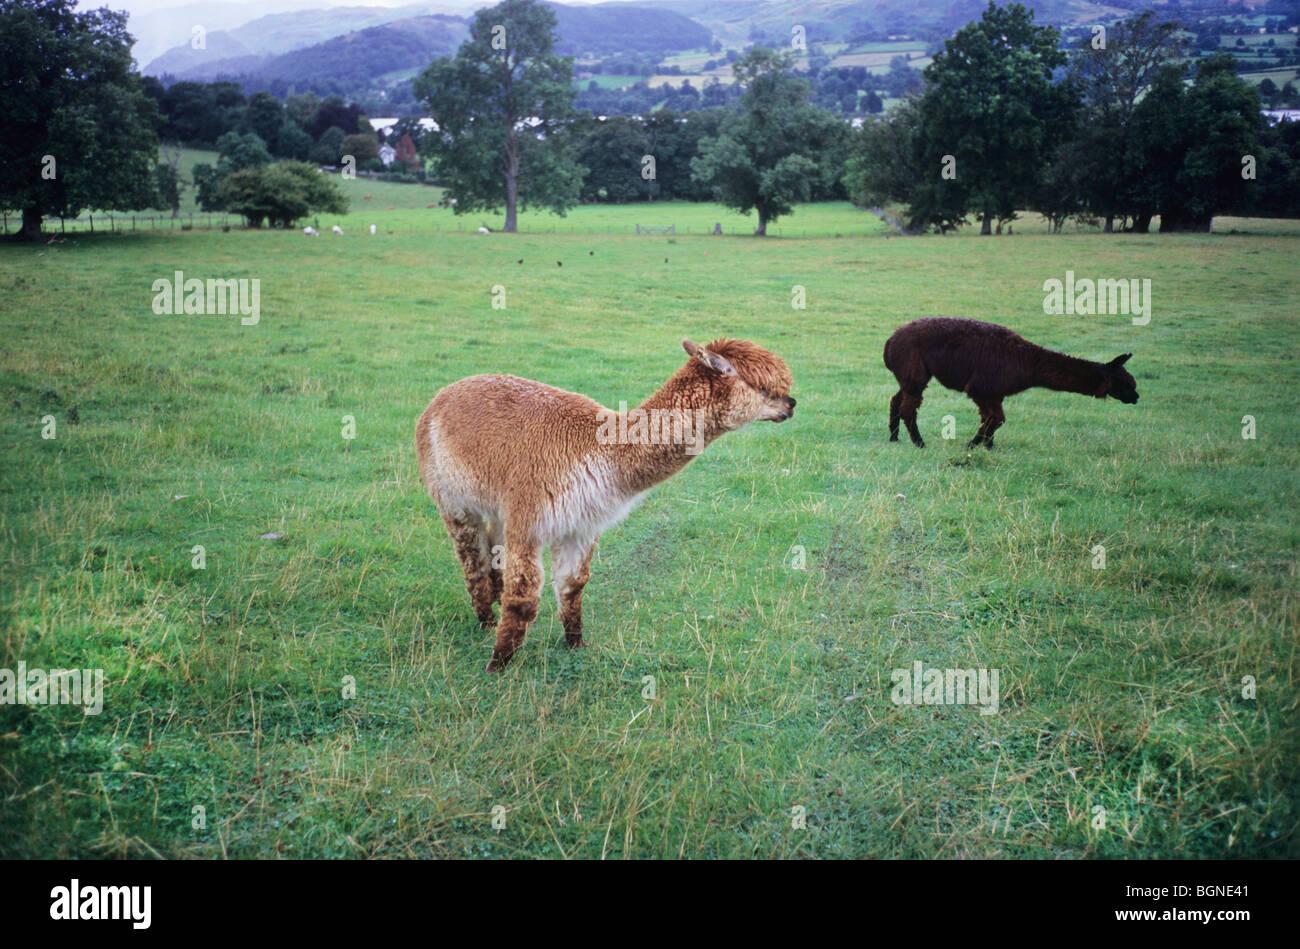 Alpaca's in the UK. Camelid Family. Types of Alpaca, Huacaya and Suri. Lama Pacos. - Stock Image